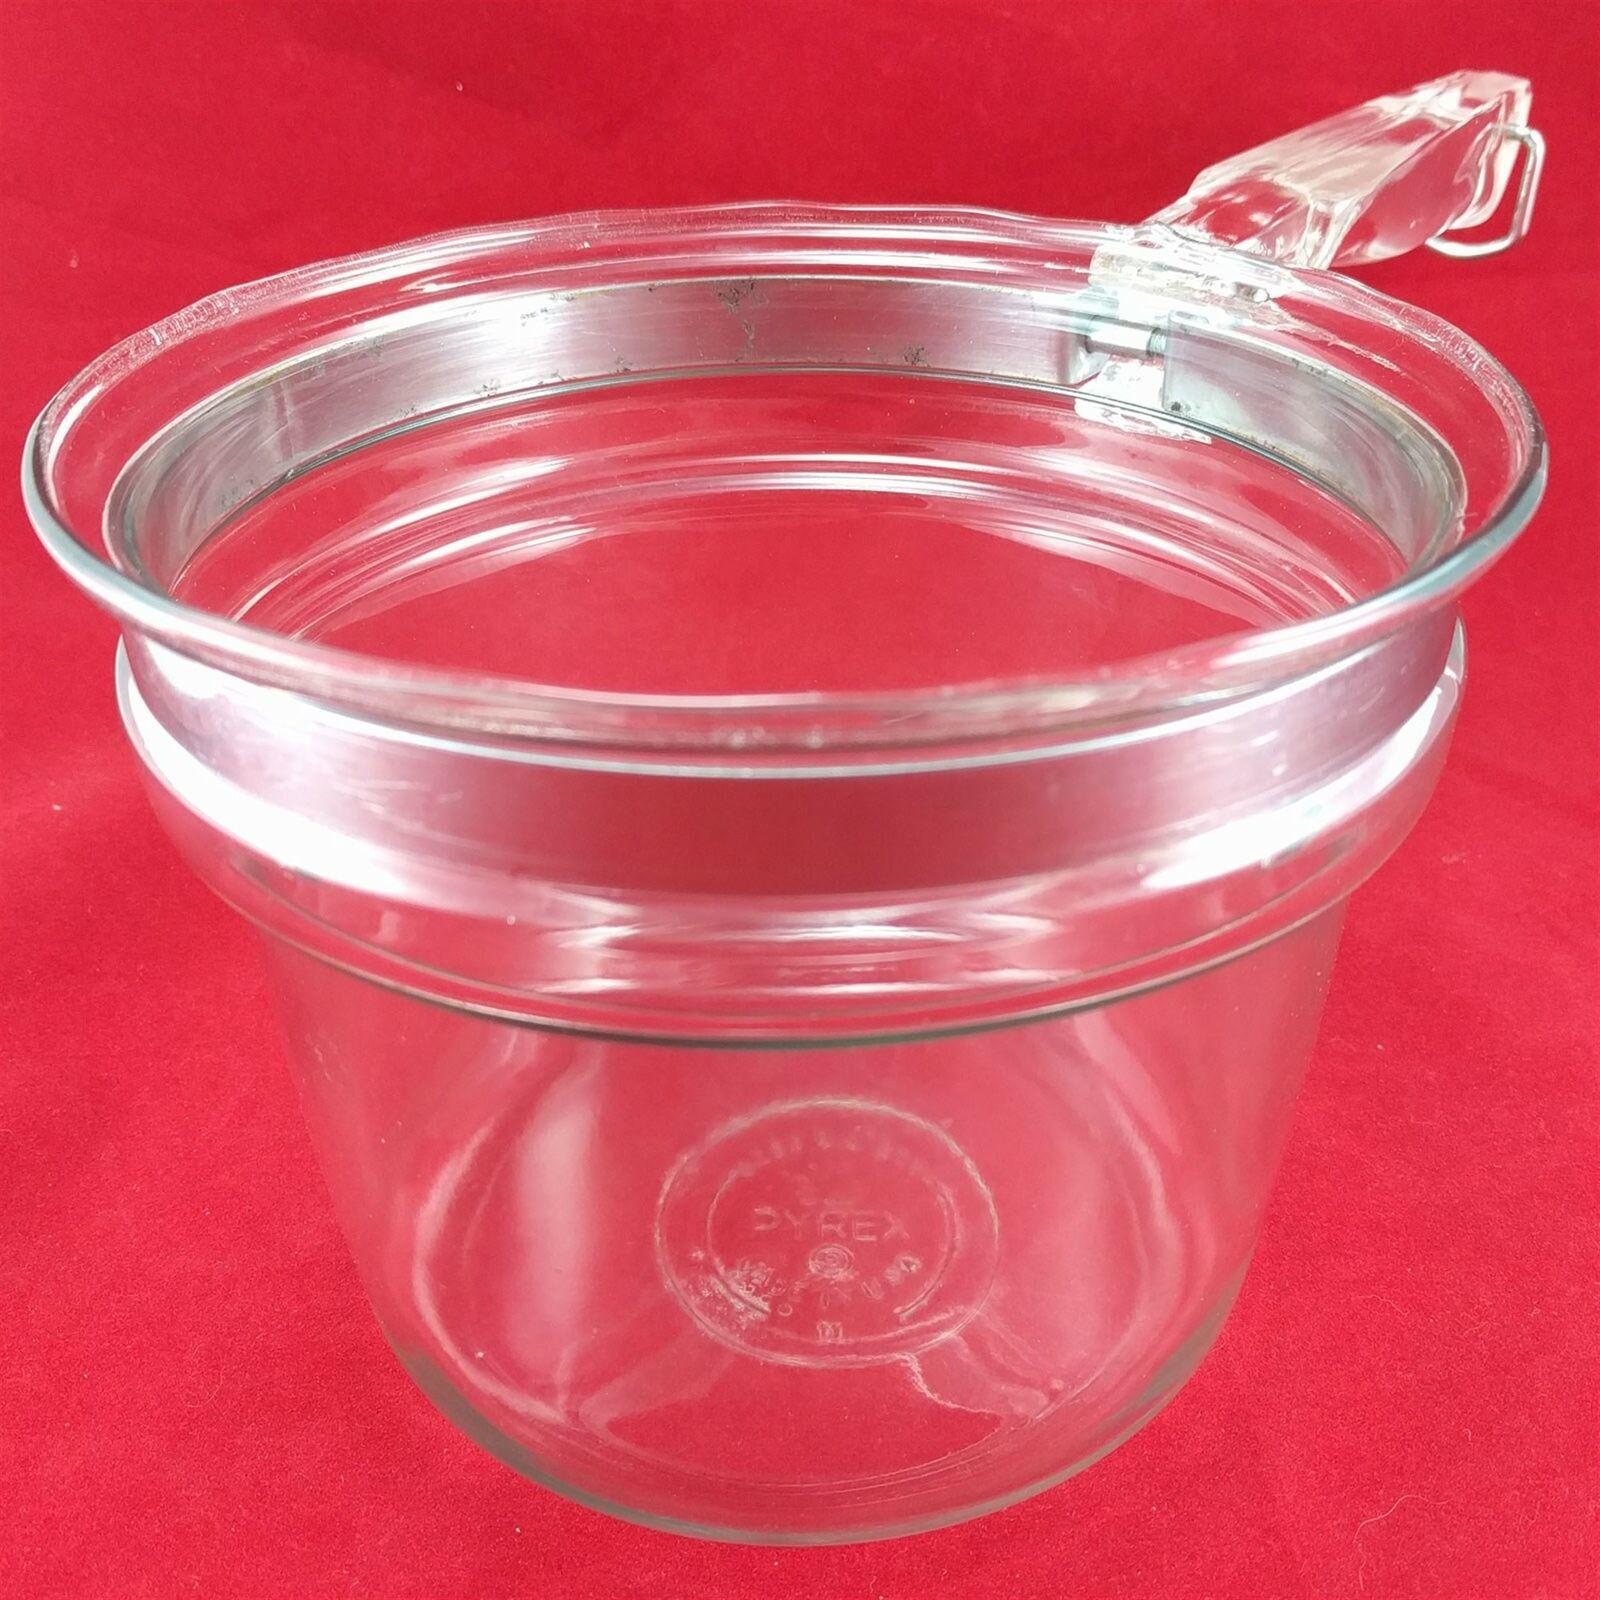 Pyrex Flameware 6283U 1½ qt Vintage Glass Saucepan w/ Stainless Steel Band image 4